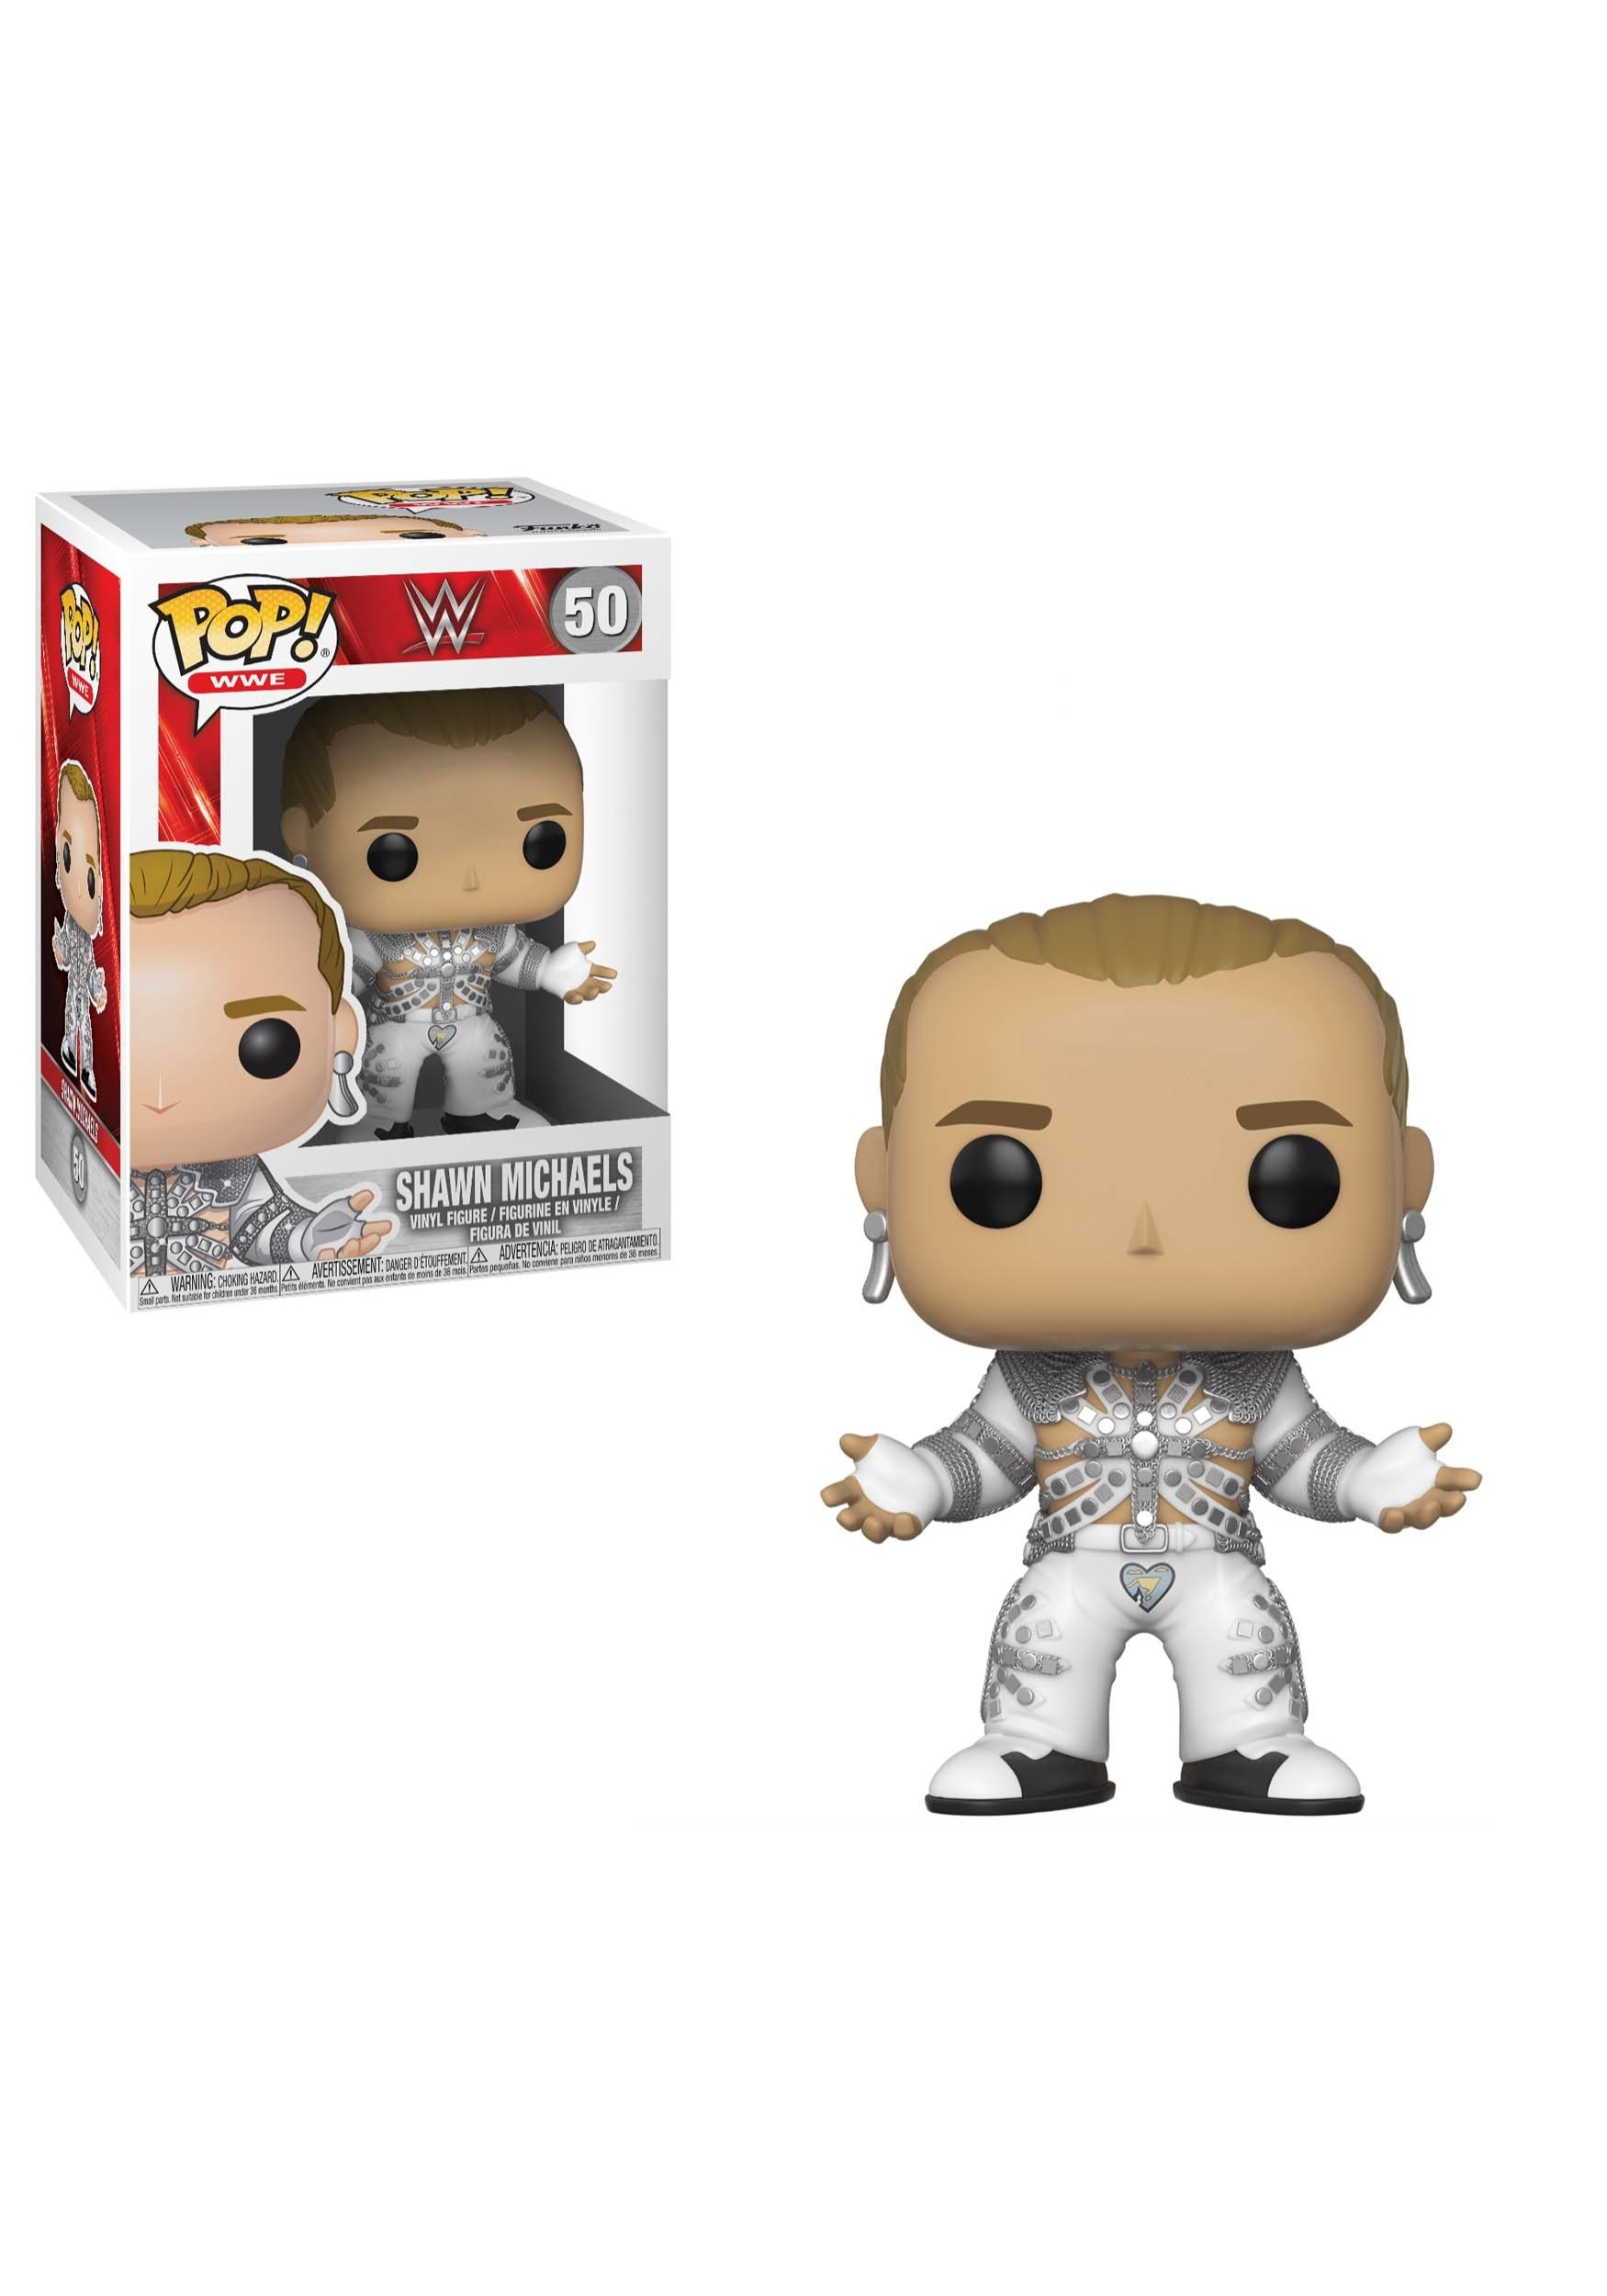 POP! WWE: Shawn Michaels Wrestlemania 12 Vinyl Figure FN29032